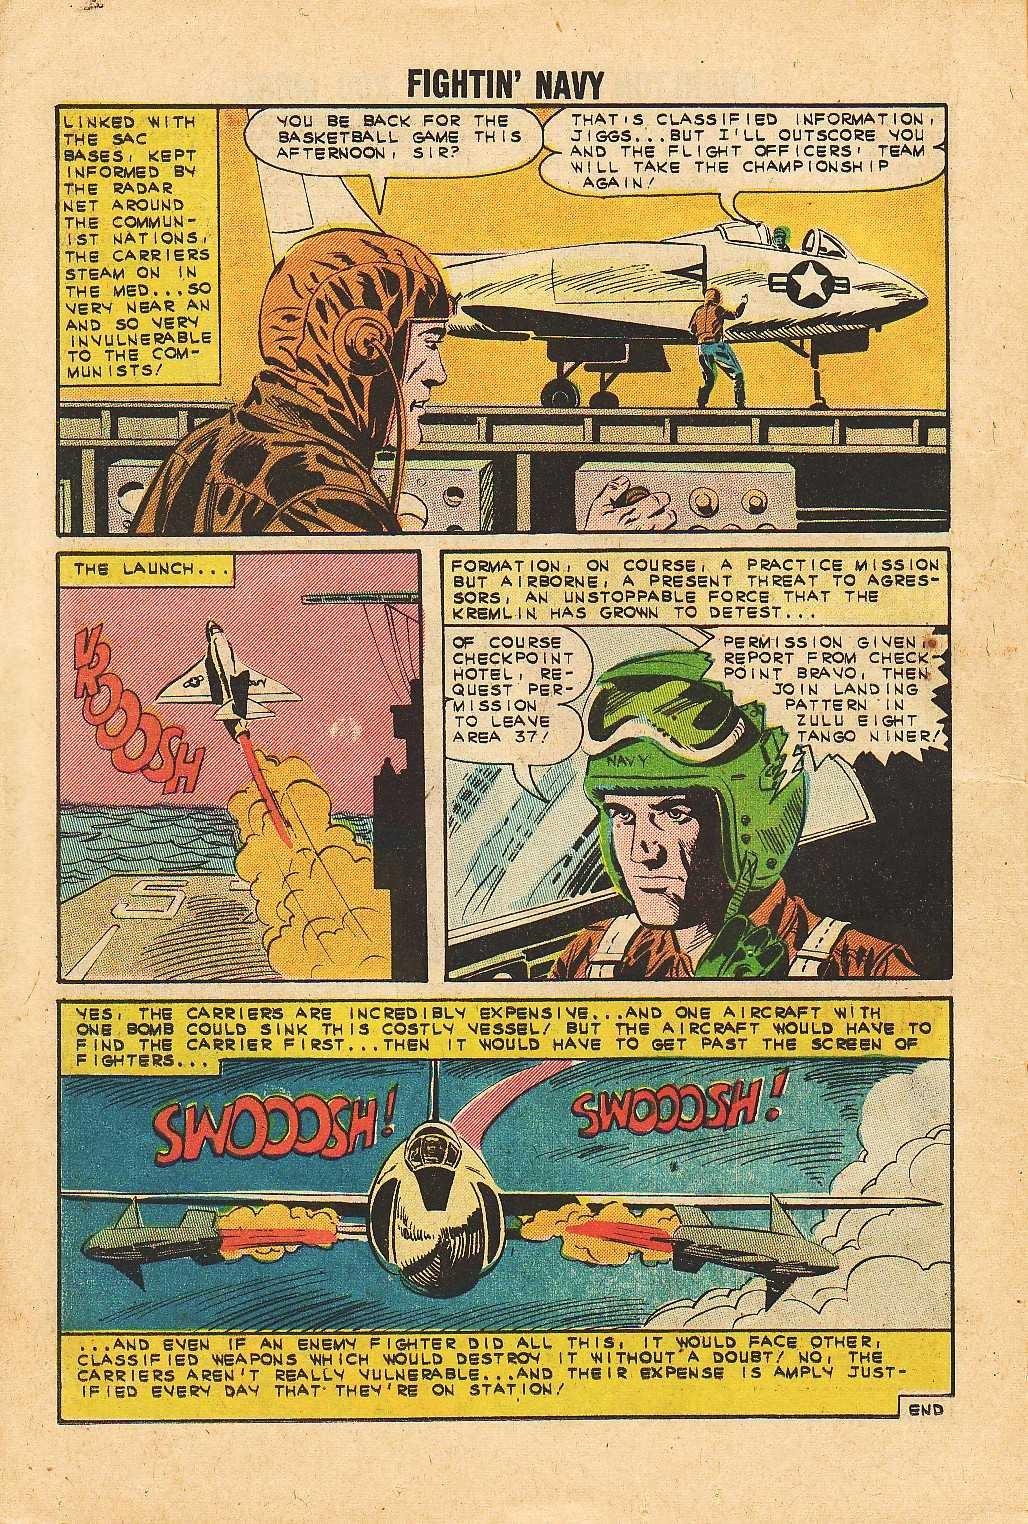 Read online Fightin' Navy comic -  Issue #113 - 14